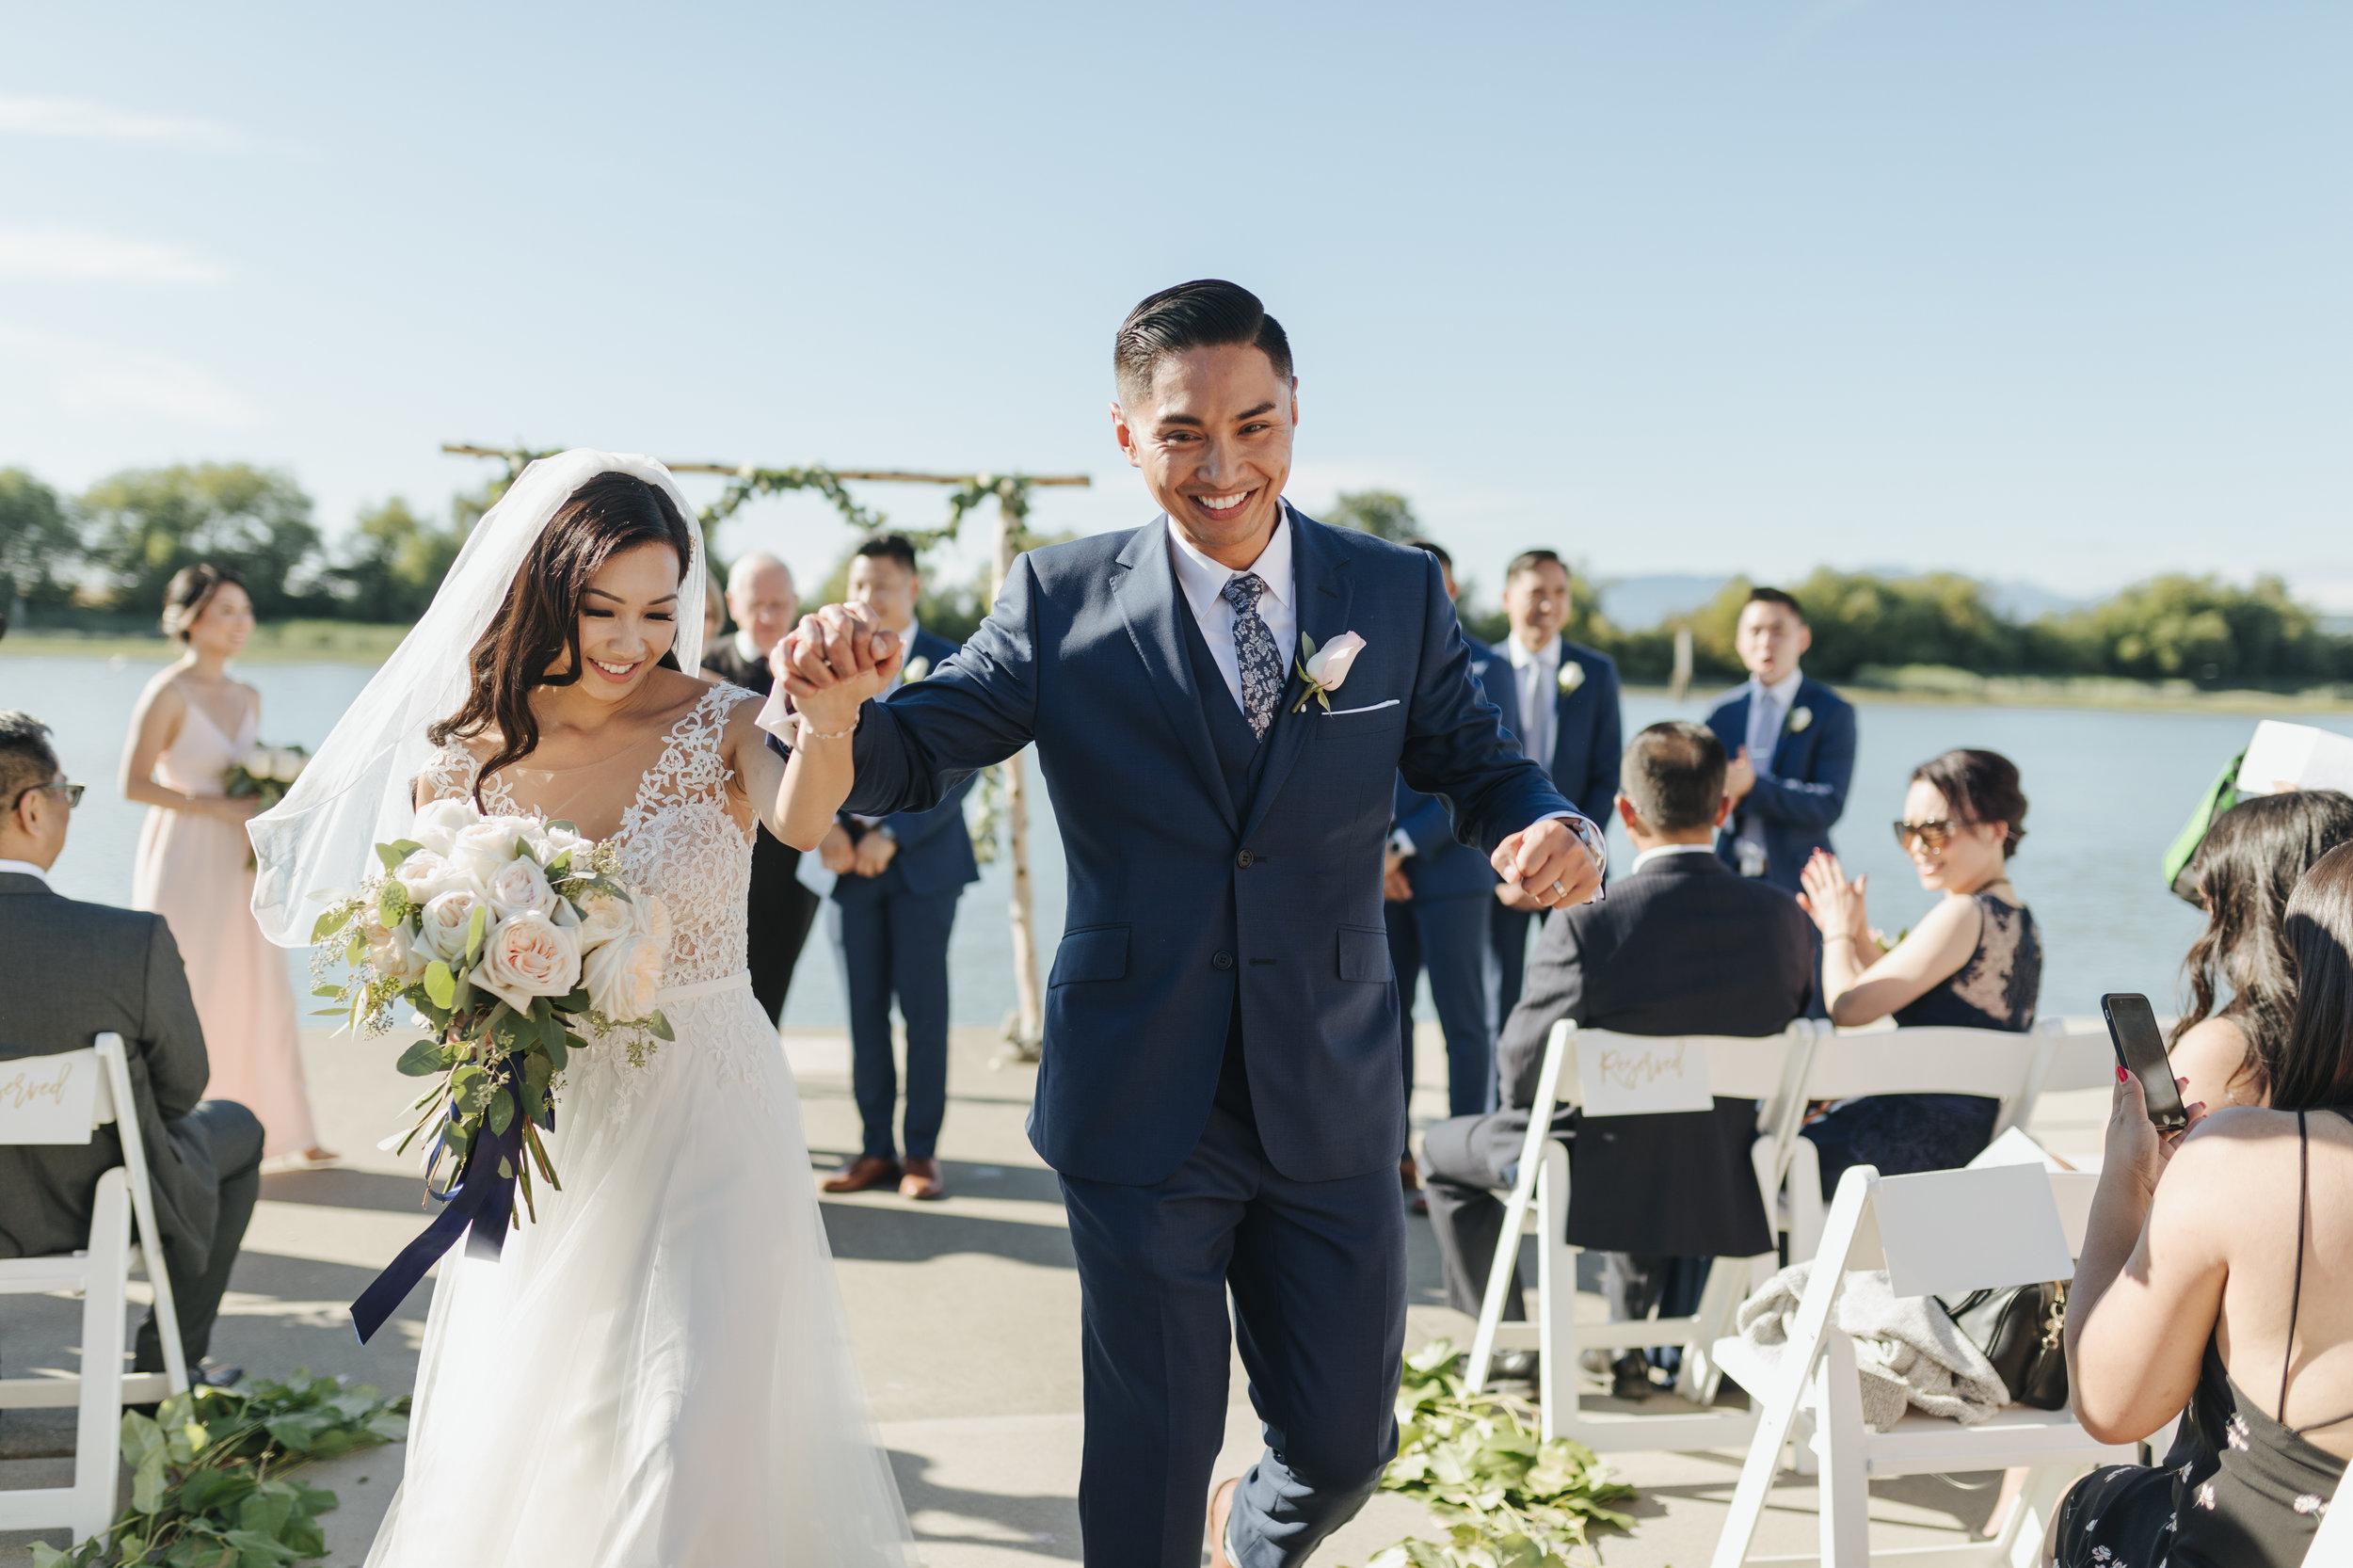 herastudios_wedding_betty_tomy_hera_selects-73.jpg